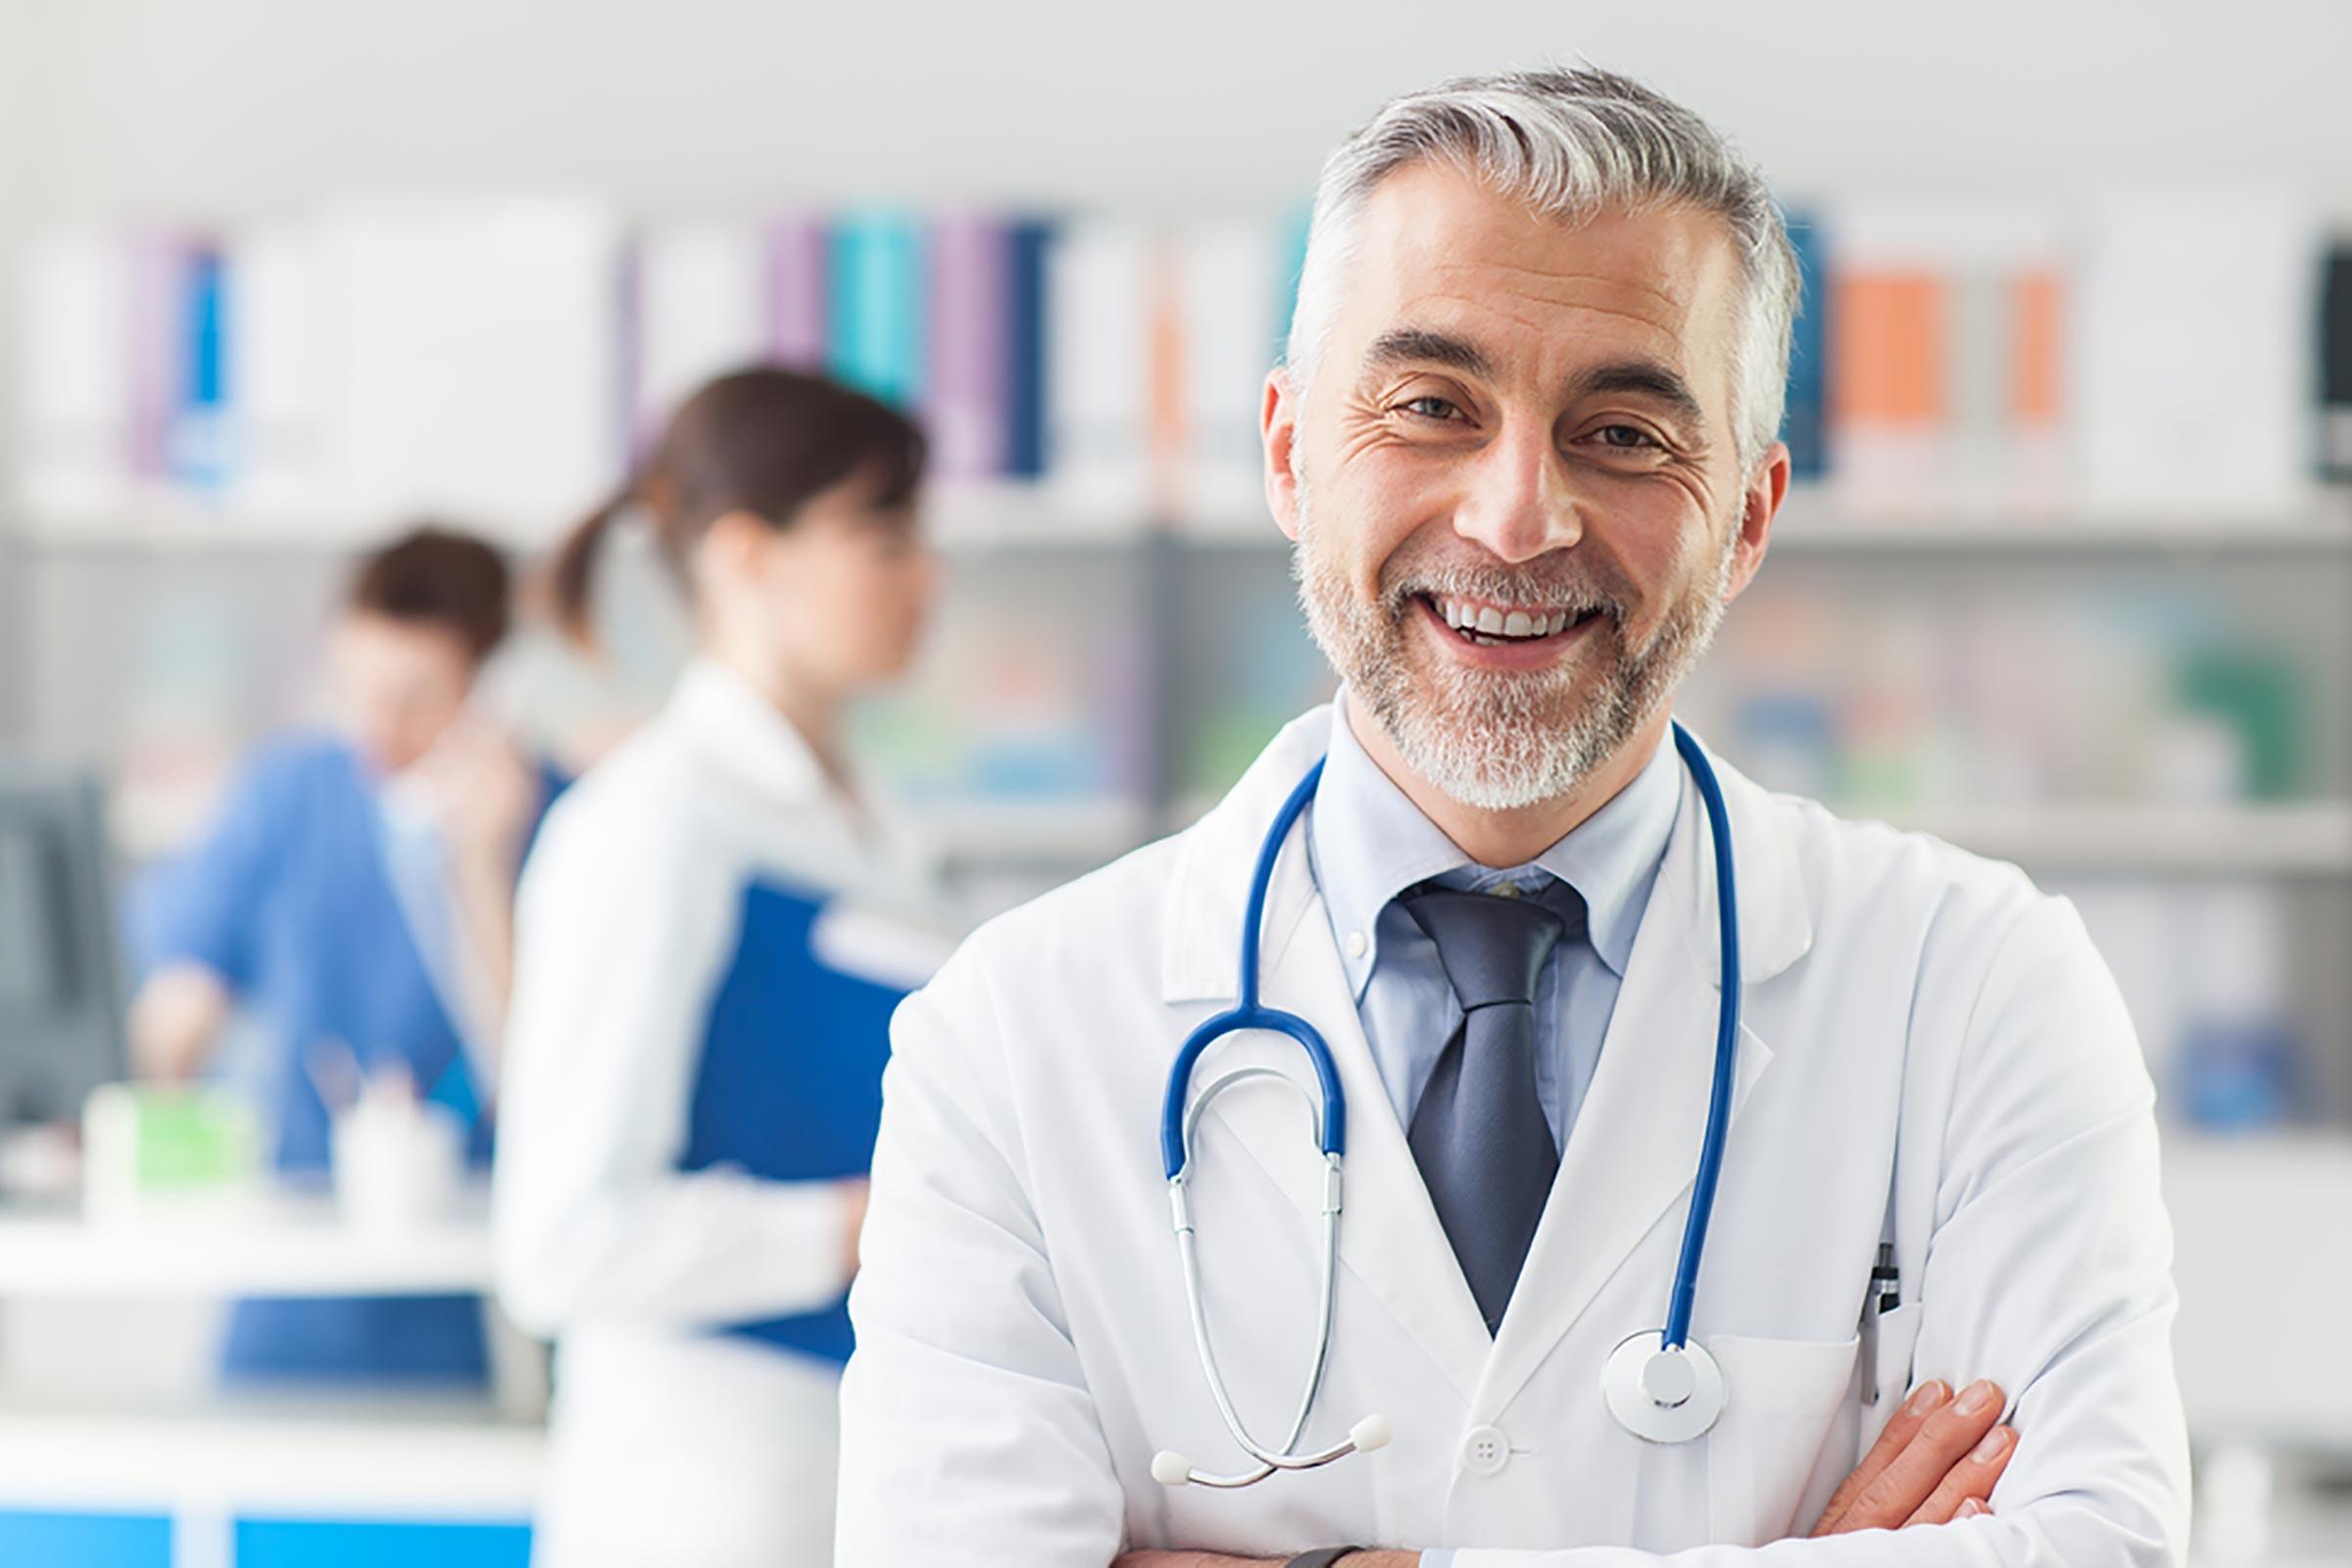 PRIMARY CARE DOCTORS